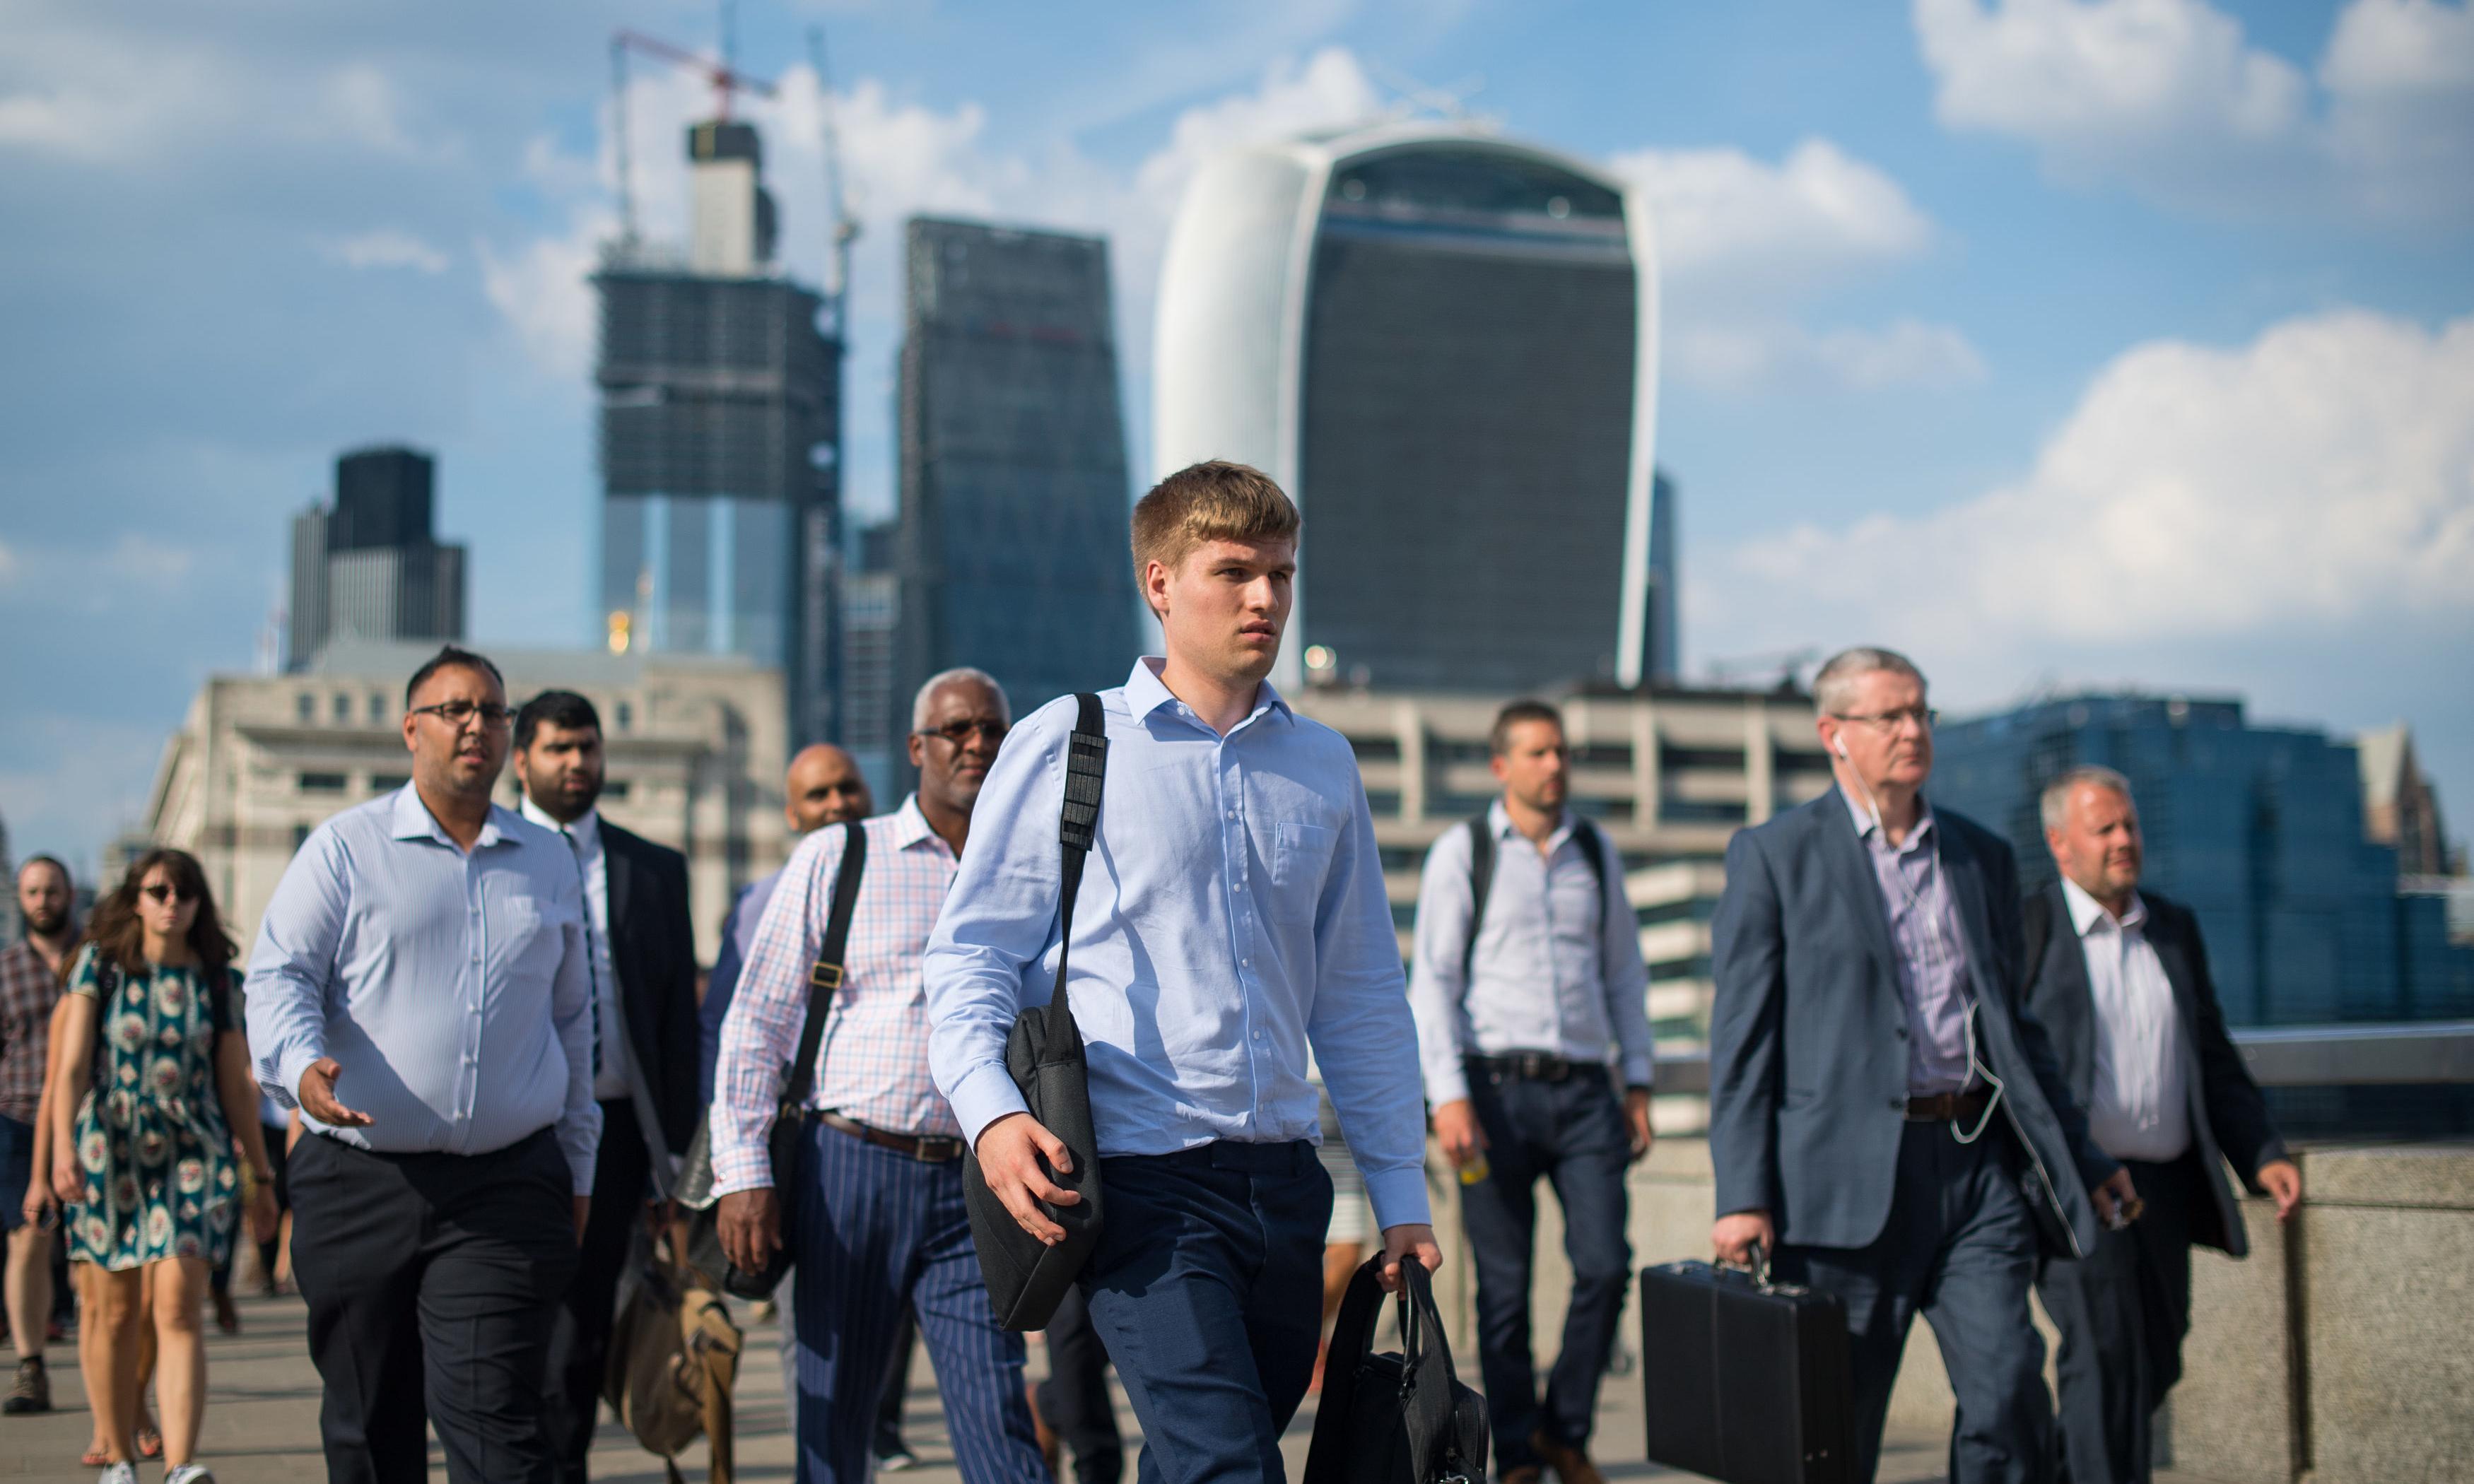 UK pay growth strong despite economic slowdown fears